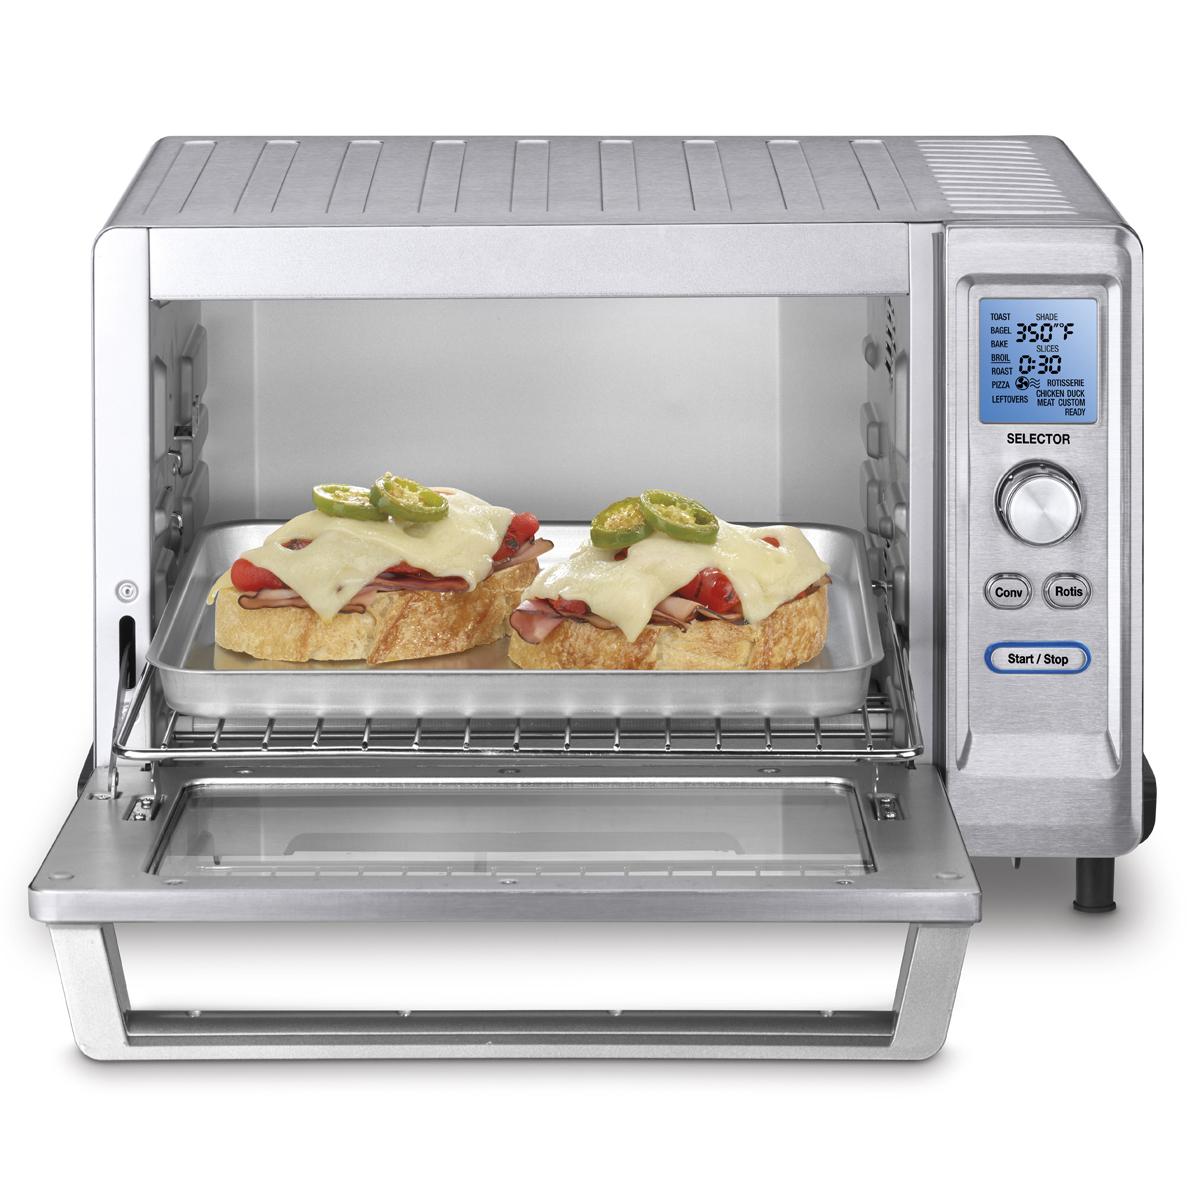 Cuisinart Rotisserie Convection Toaster Oven: Rotisserie Convection Toaster Oven